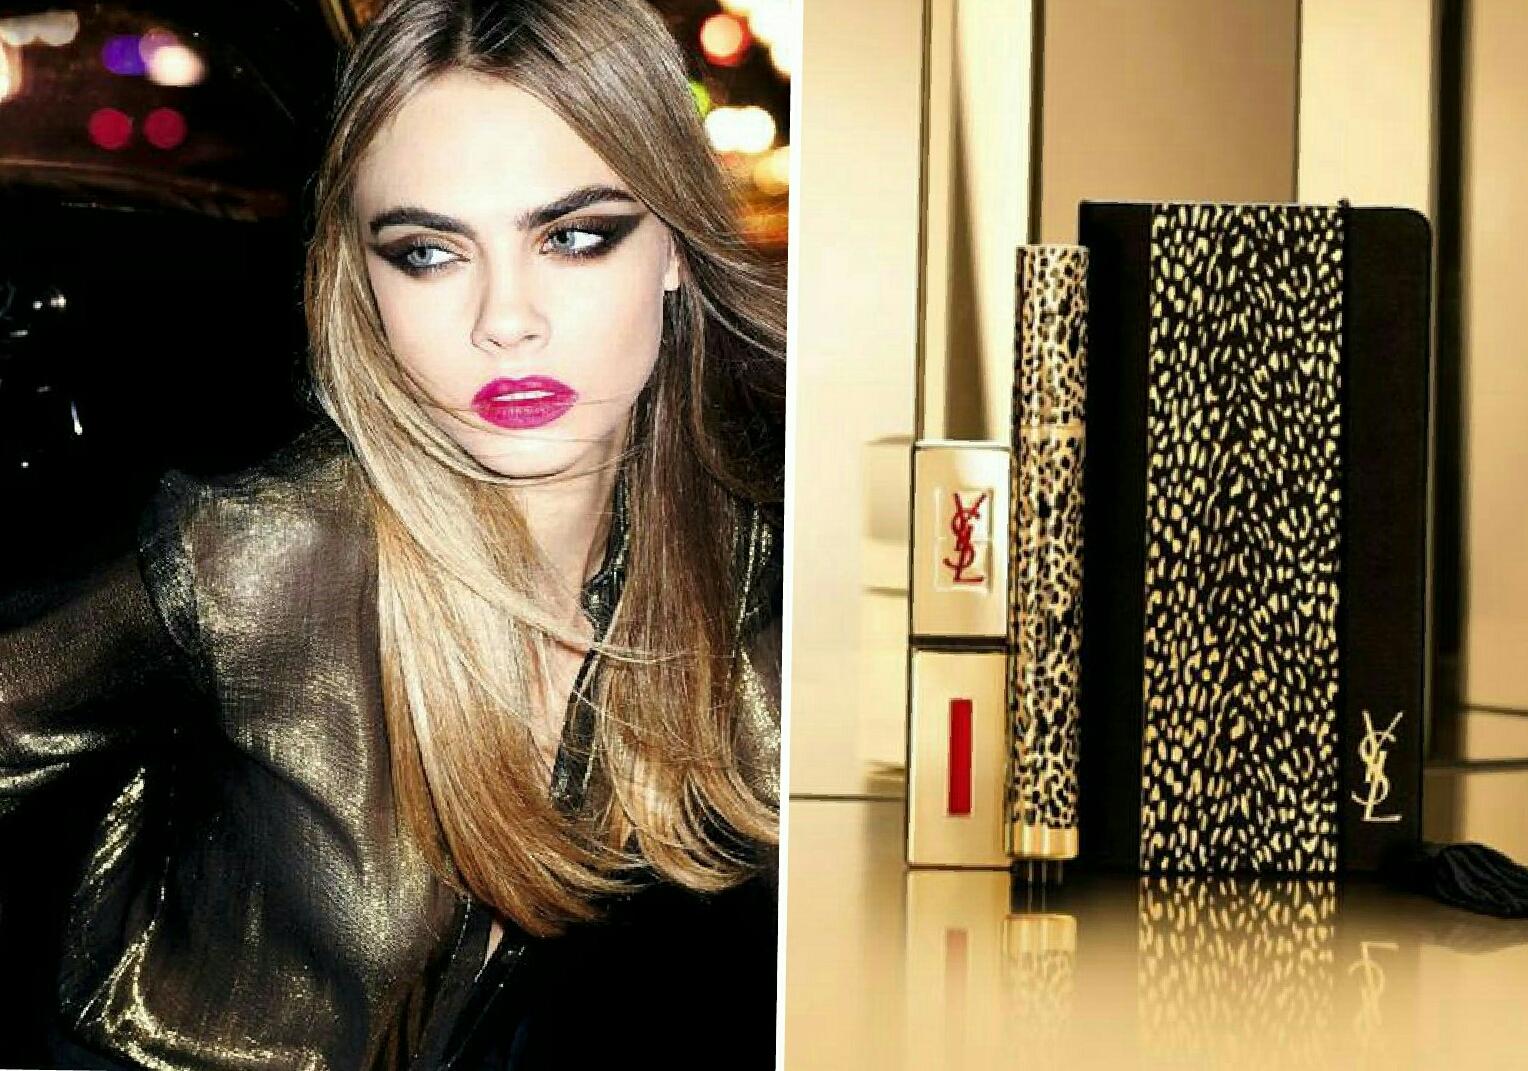 Nuova Collezione Makeup YSL Wildly Gold Natale 2014 ...